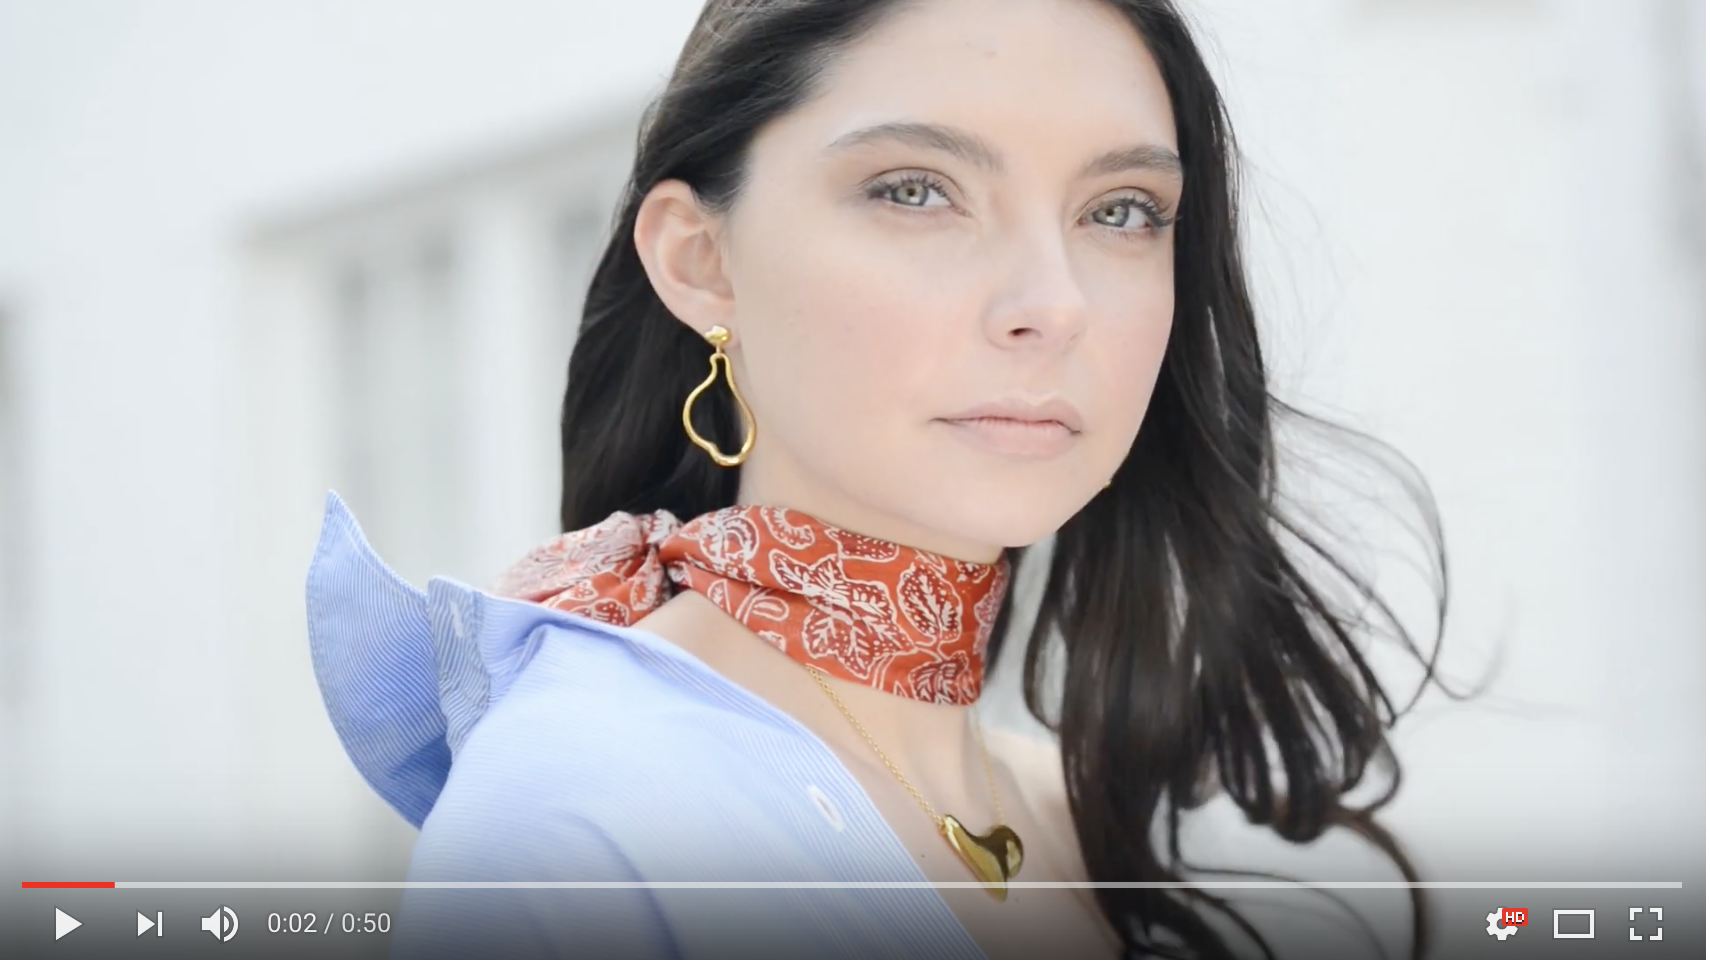 Felice Dahl Skargard Jewellery Campaign Video